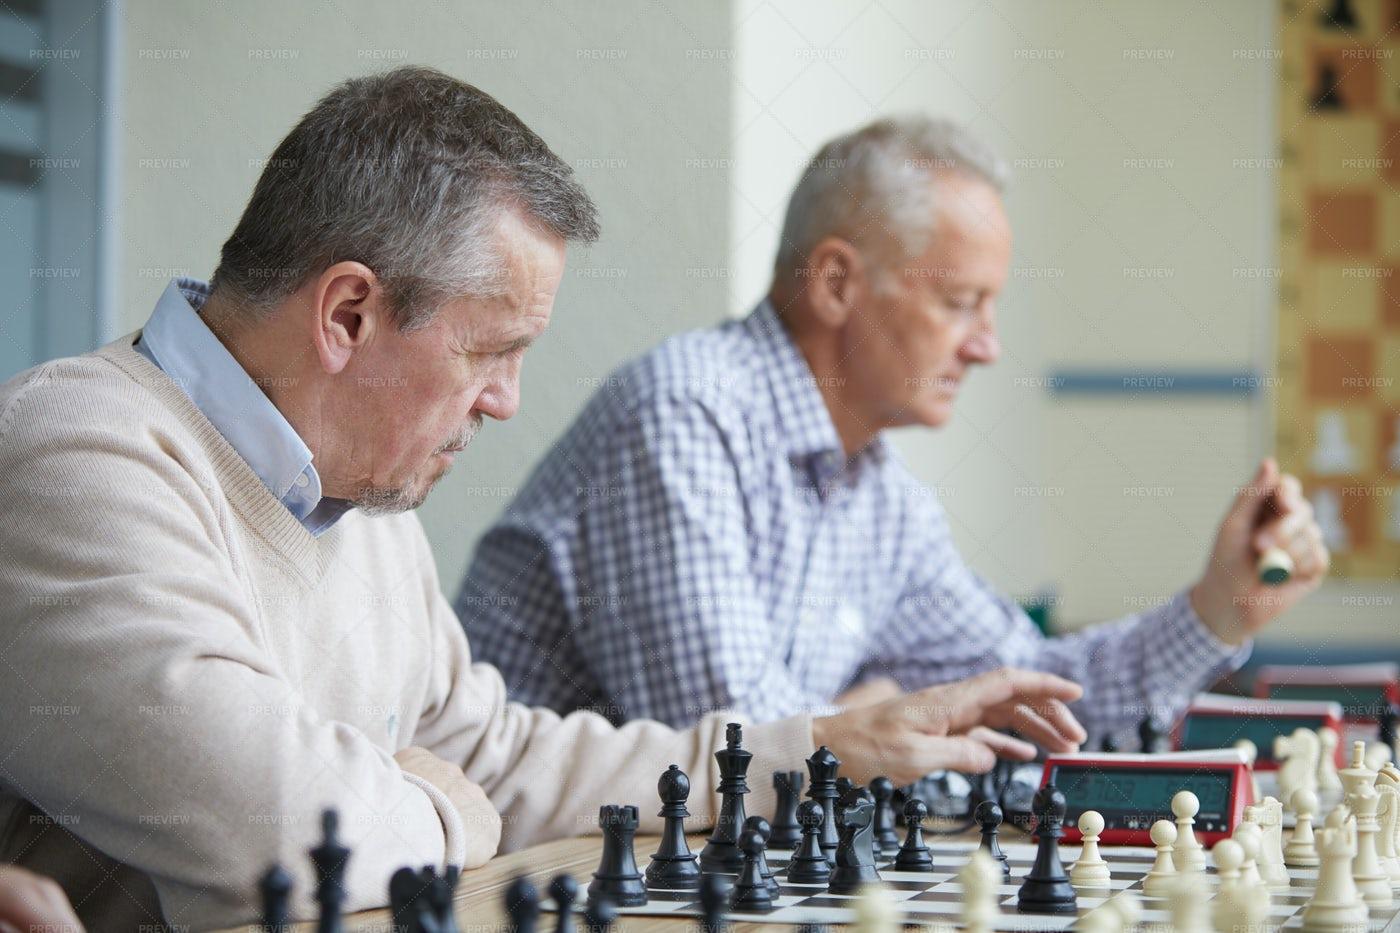 Amateur Chess Tournament: Stock Photos